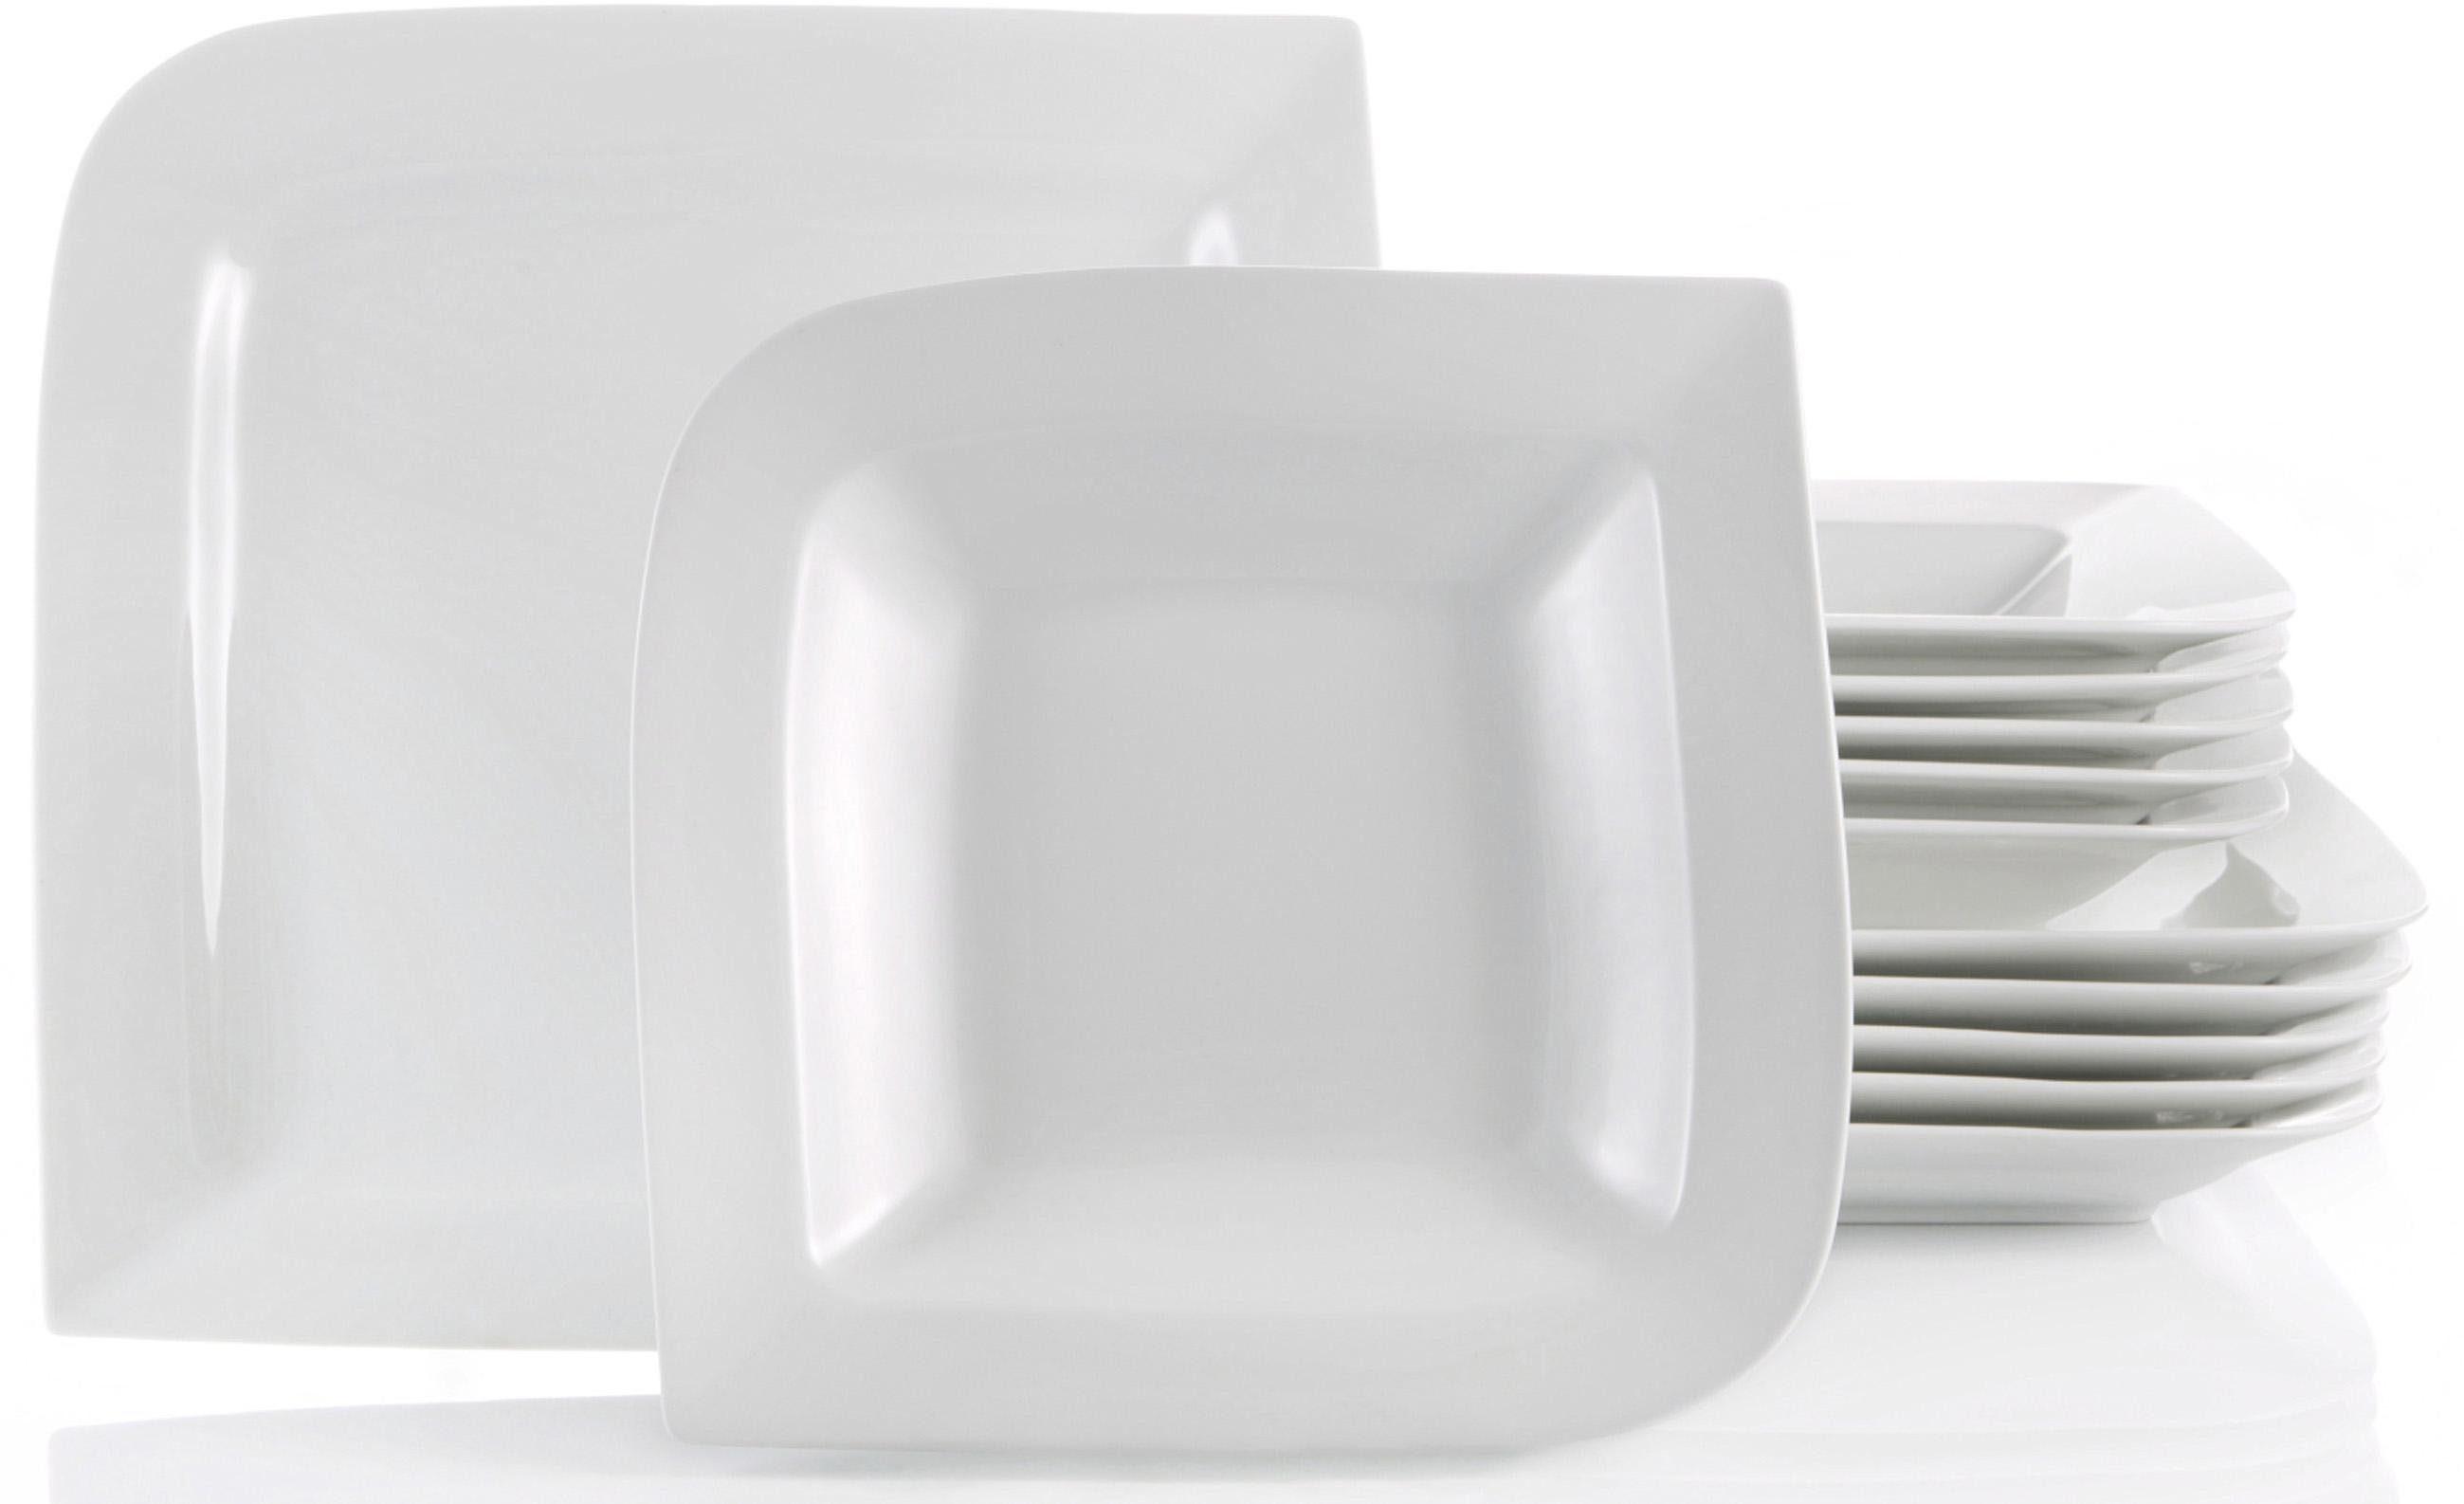 CreaTable Tafelservice Porzellan, 12 Teile, »FANTASIA«